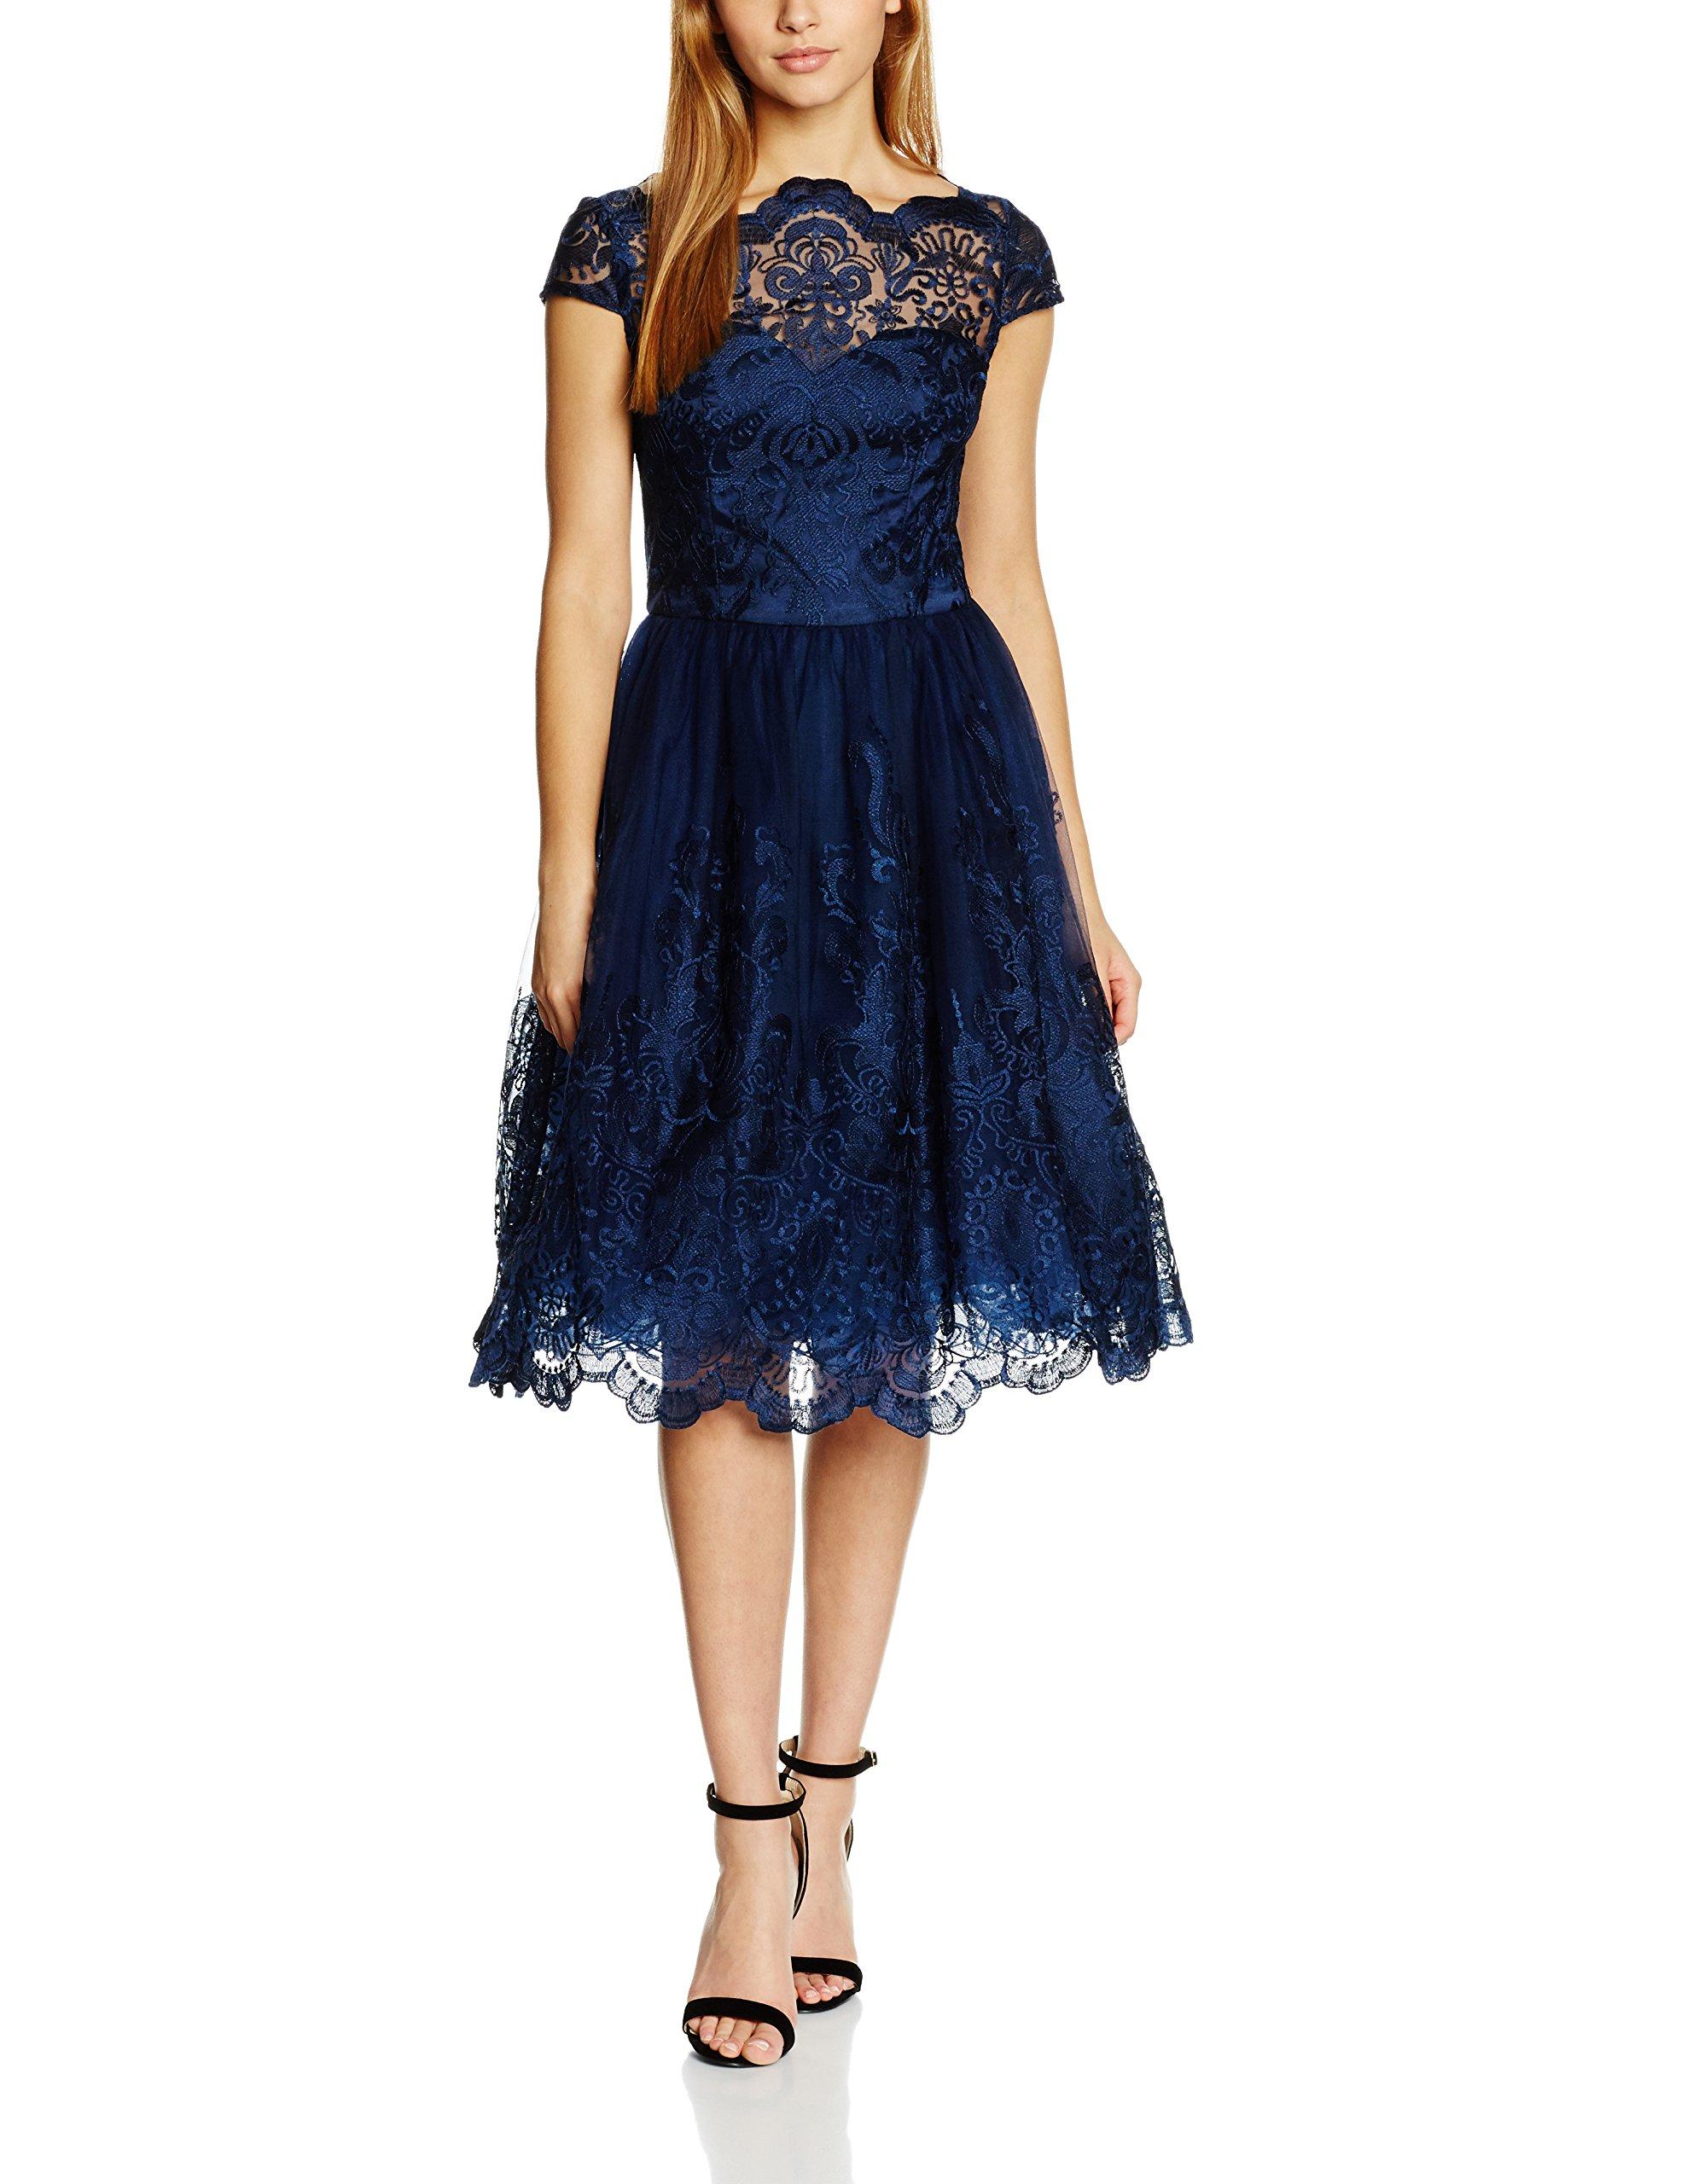 Femme 41735kbl London Cap Style Sleeve Baroque Chi RobeBleunavy34 y6Ybfg7v